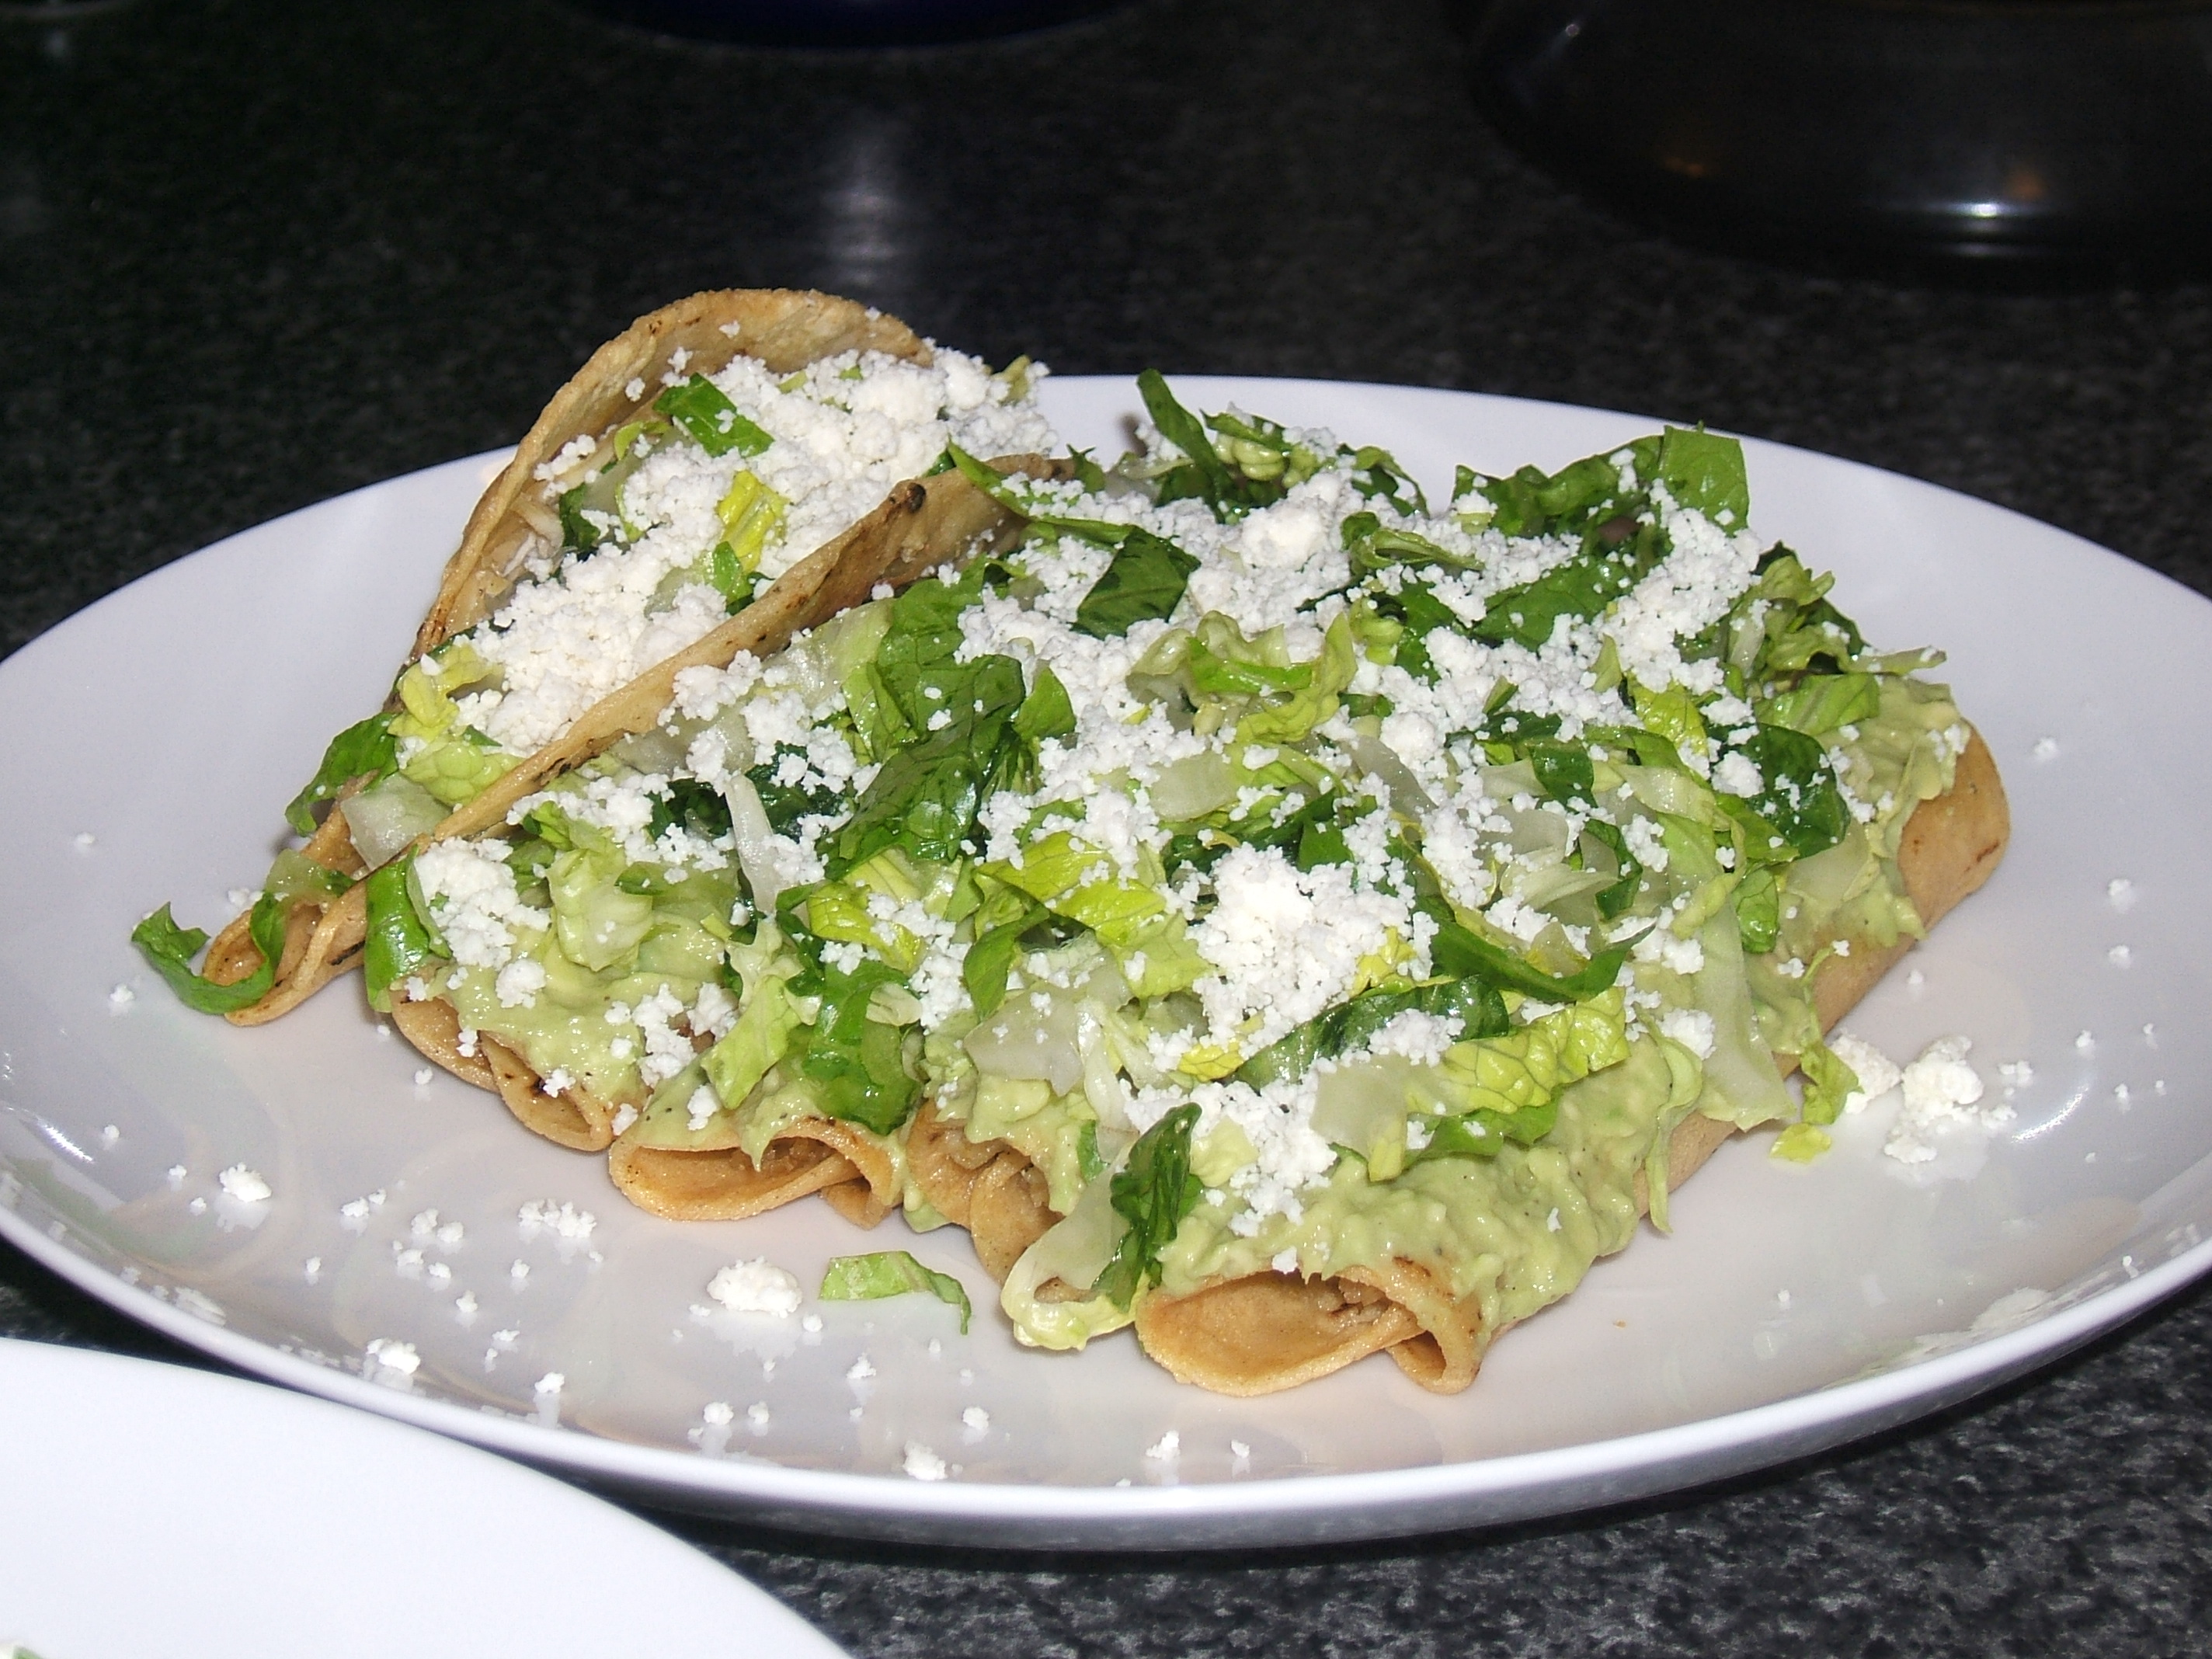 Flautas, and a taco